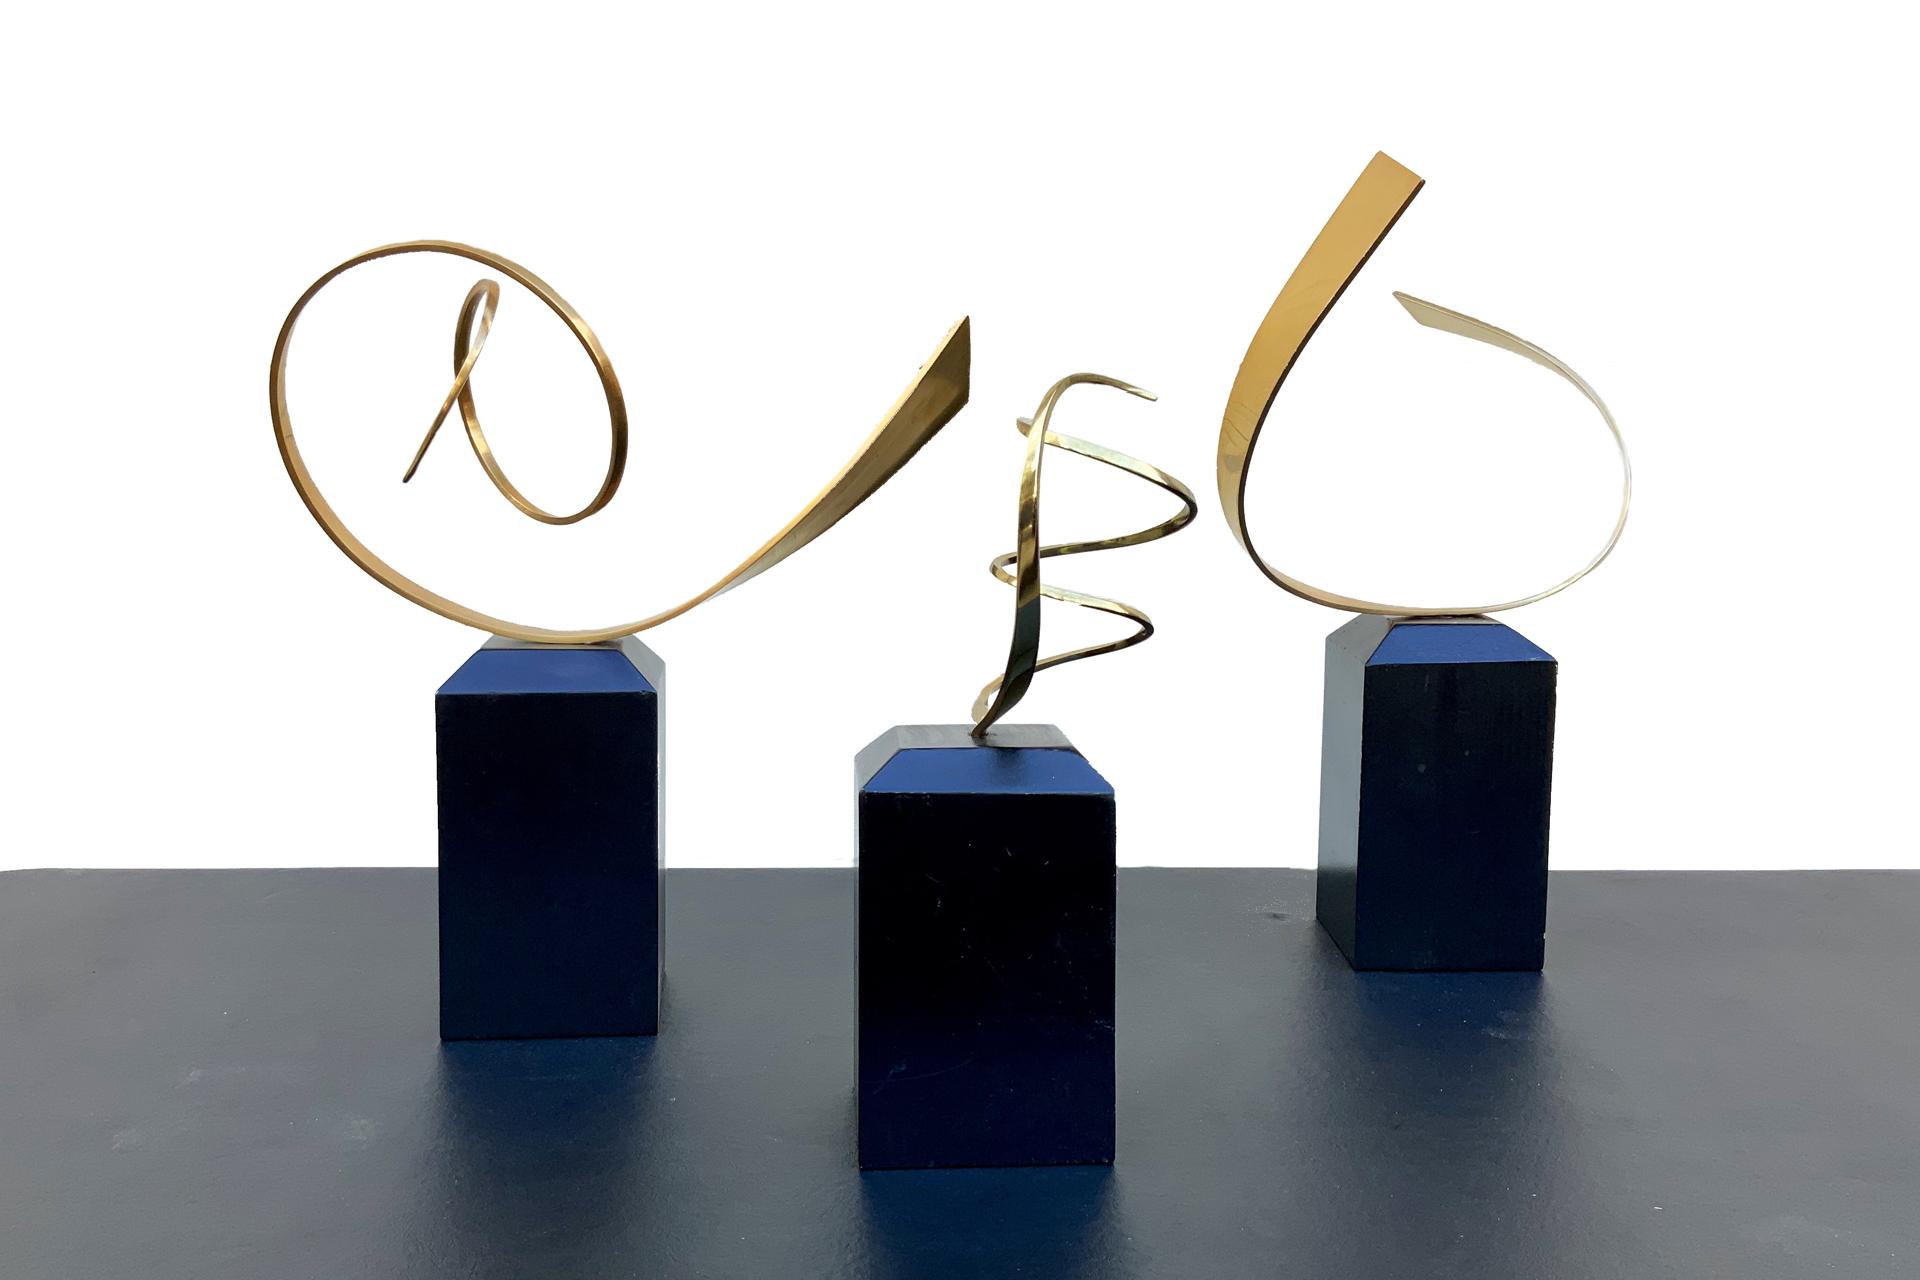 Sculpture 1 by Martin Conley (Hillsboro, OR)